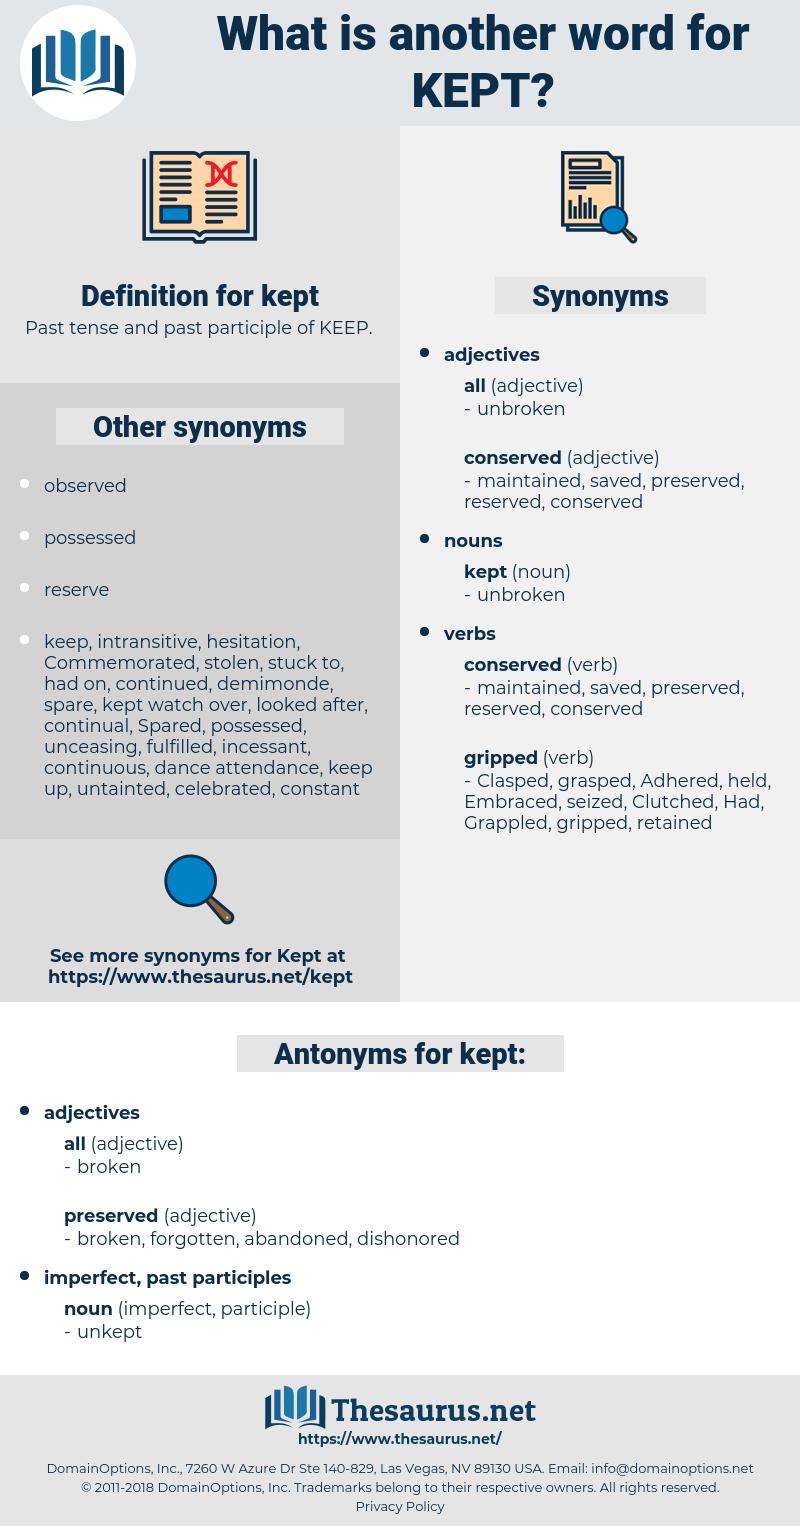 kept, synonym kept, another word for kept, words like kept, thesaurus kept